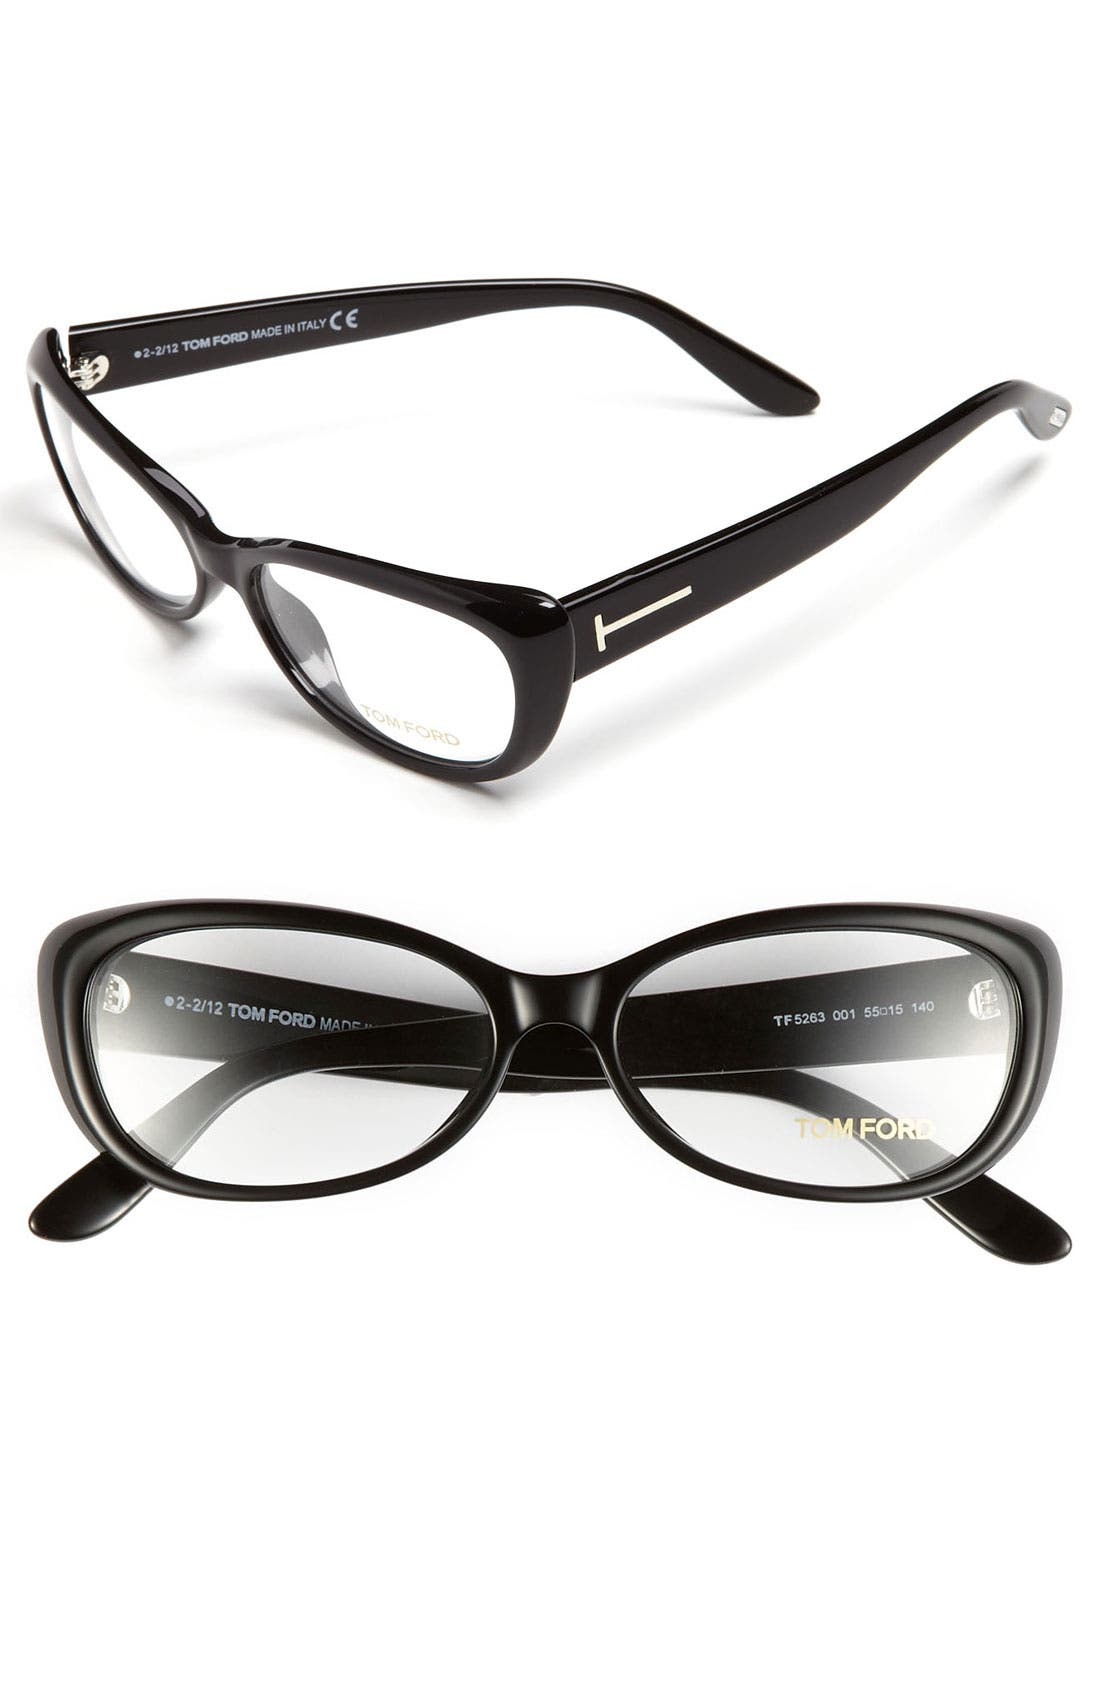 Alternate Image 1 Selected - Tom Ford Soft Cat's Eye 55mm Optical Glasses (Online Only)